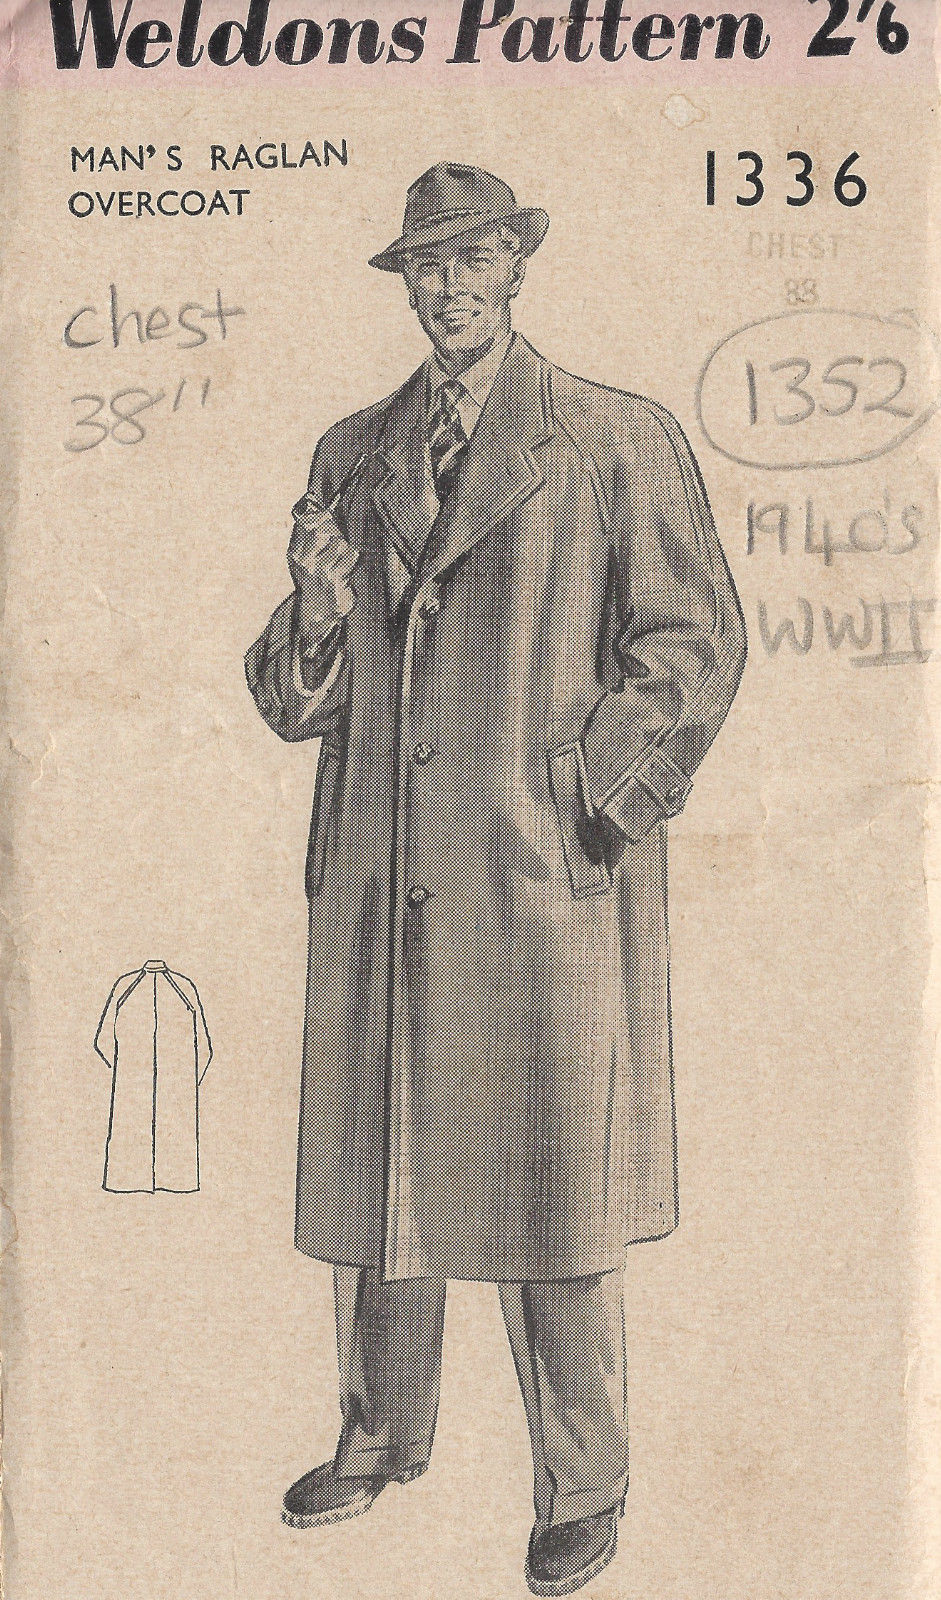 1940s Ww2 Vintage Sewing Pattern Men S Raglan Overcoat C38